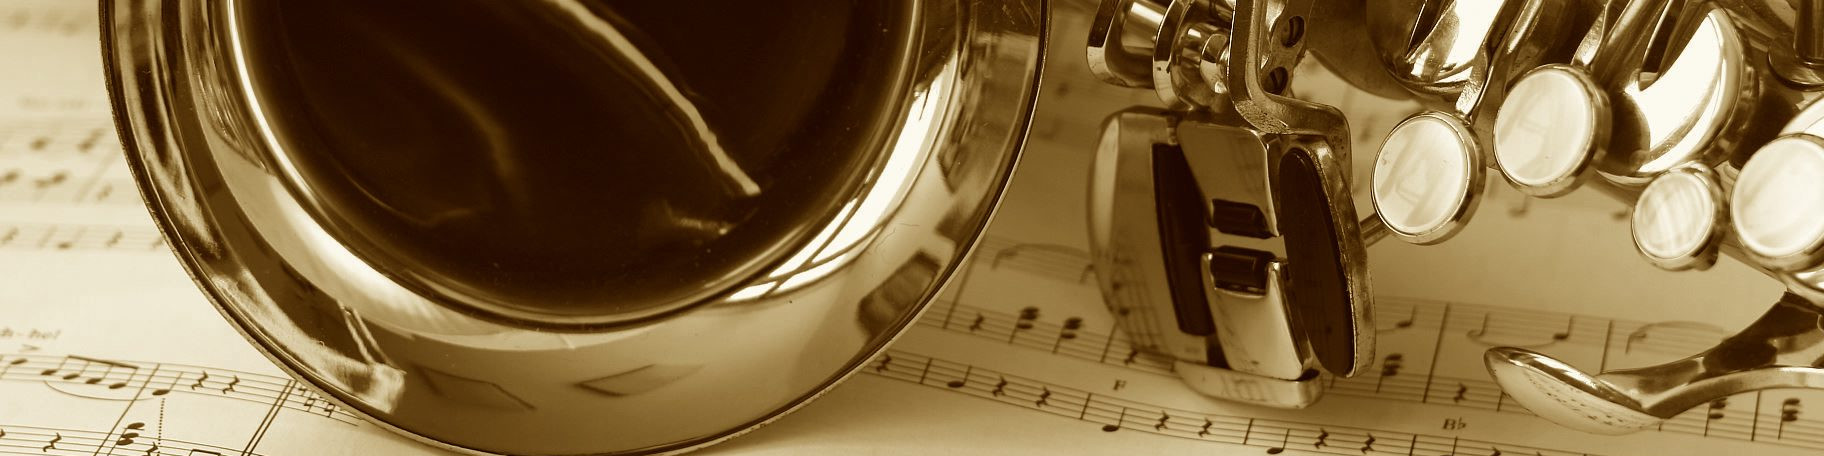 saxophone_1824*456